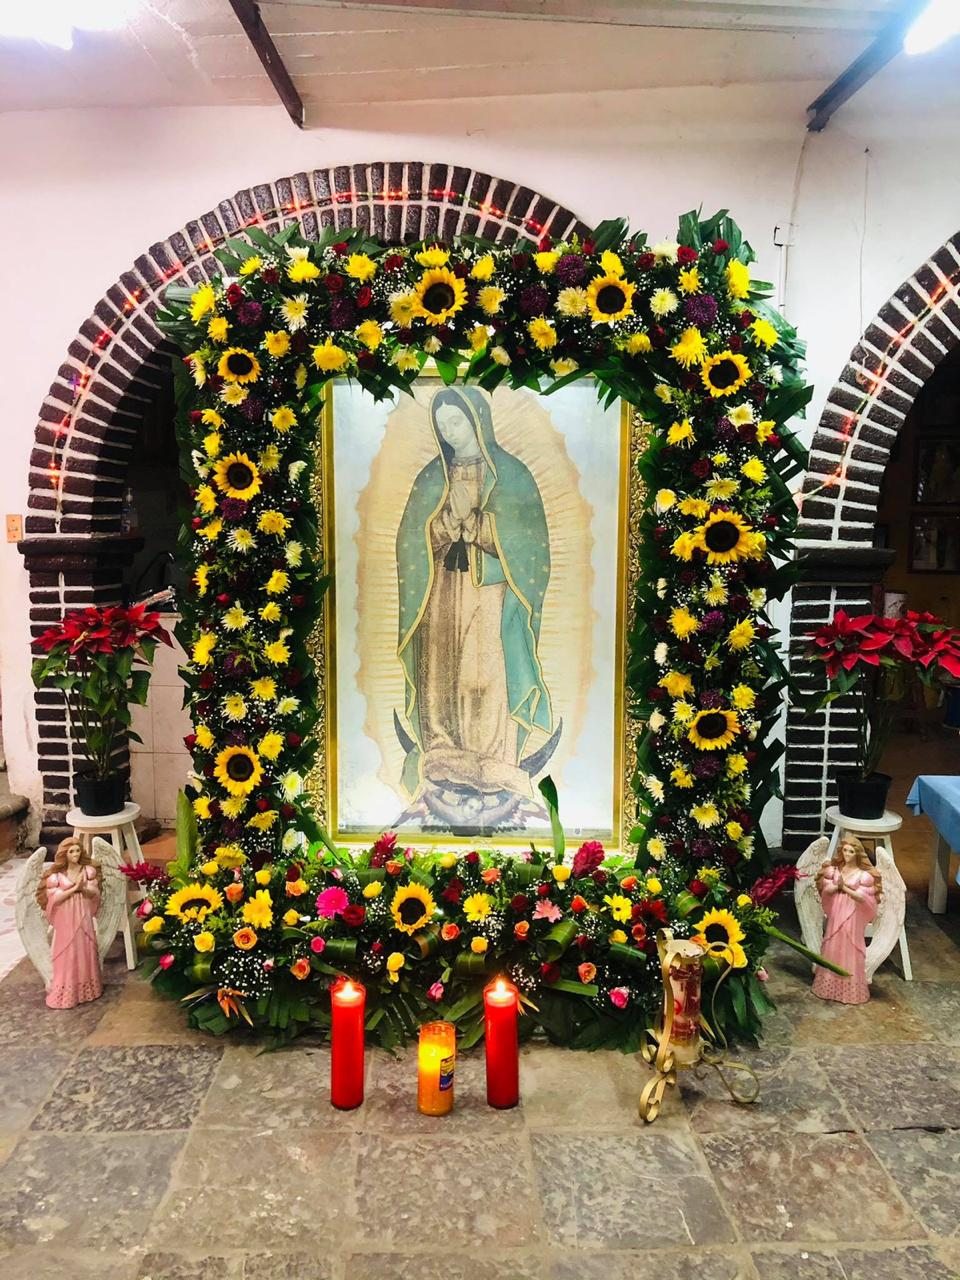 Maricarmen Contreras Ontiveros, Arcelia, Guerrero, México